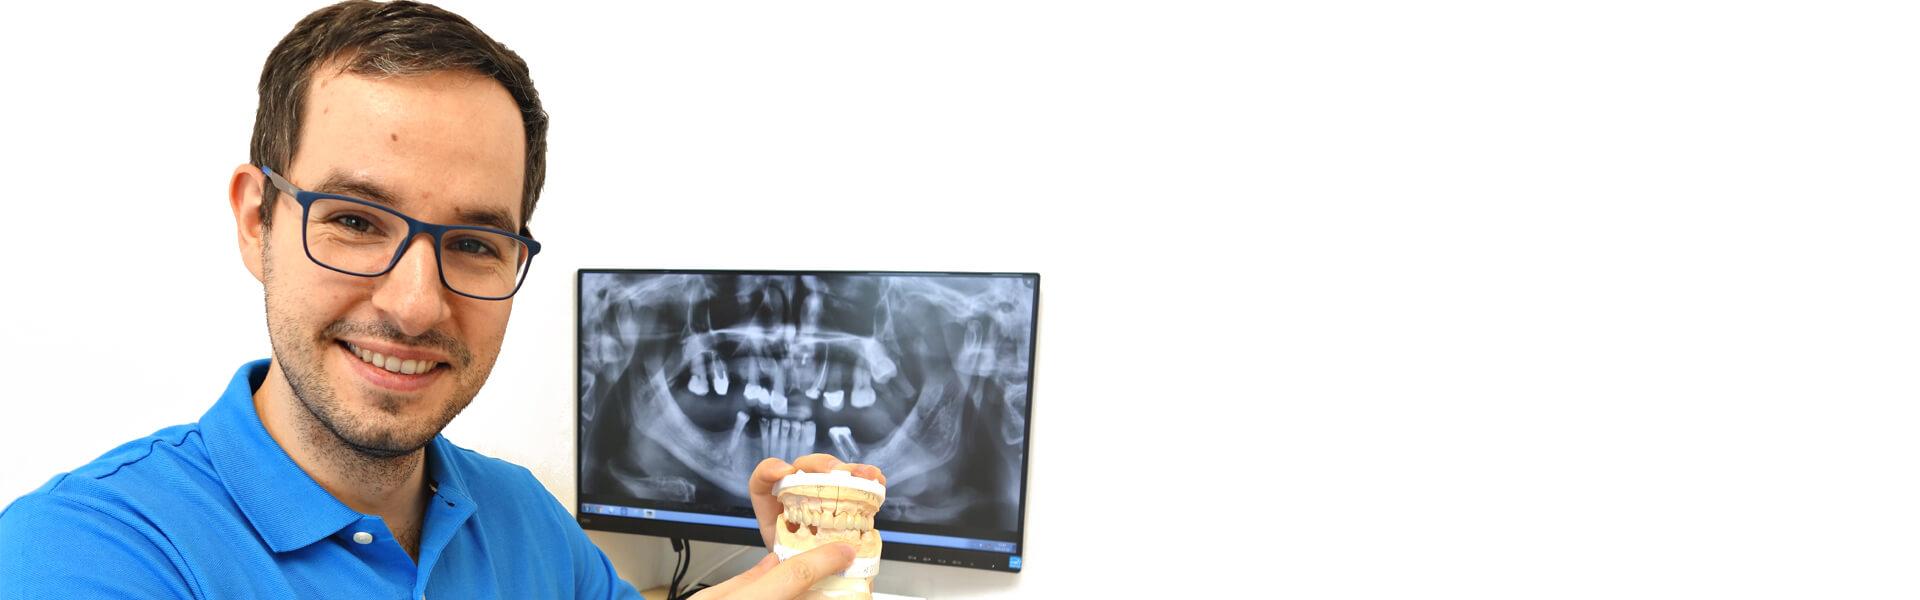 gabinet stomatologiczny tczew